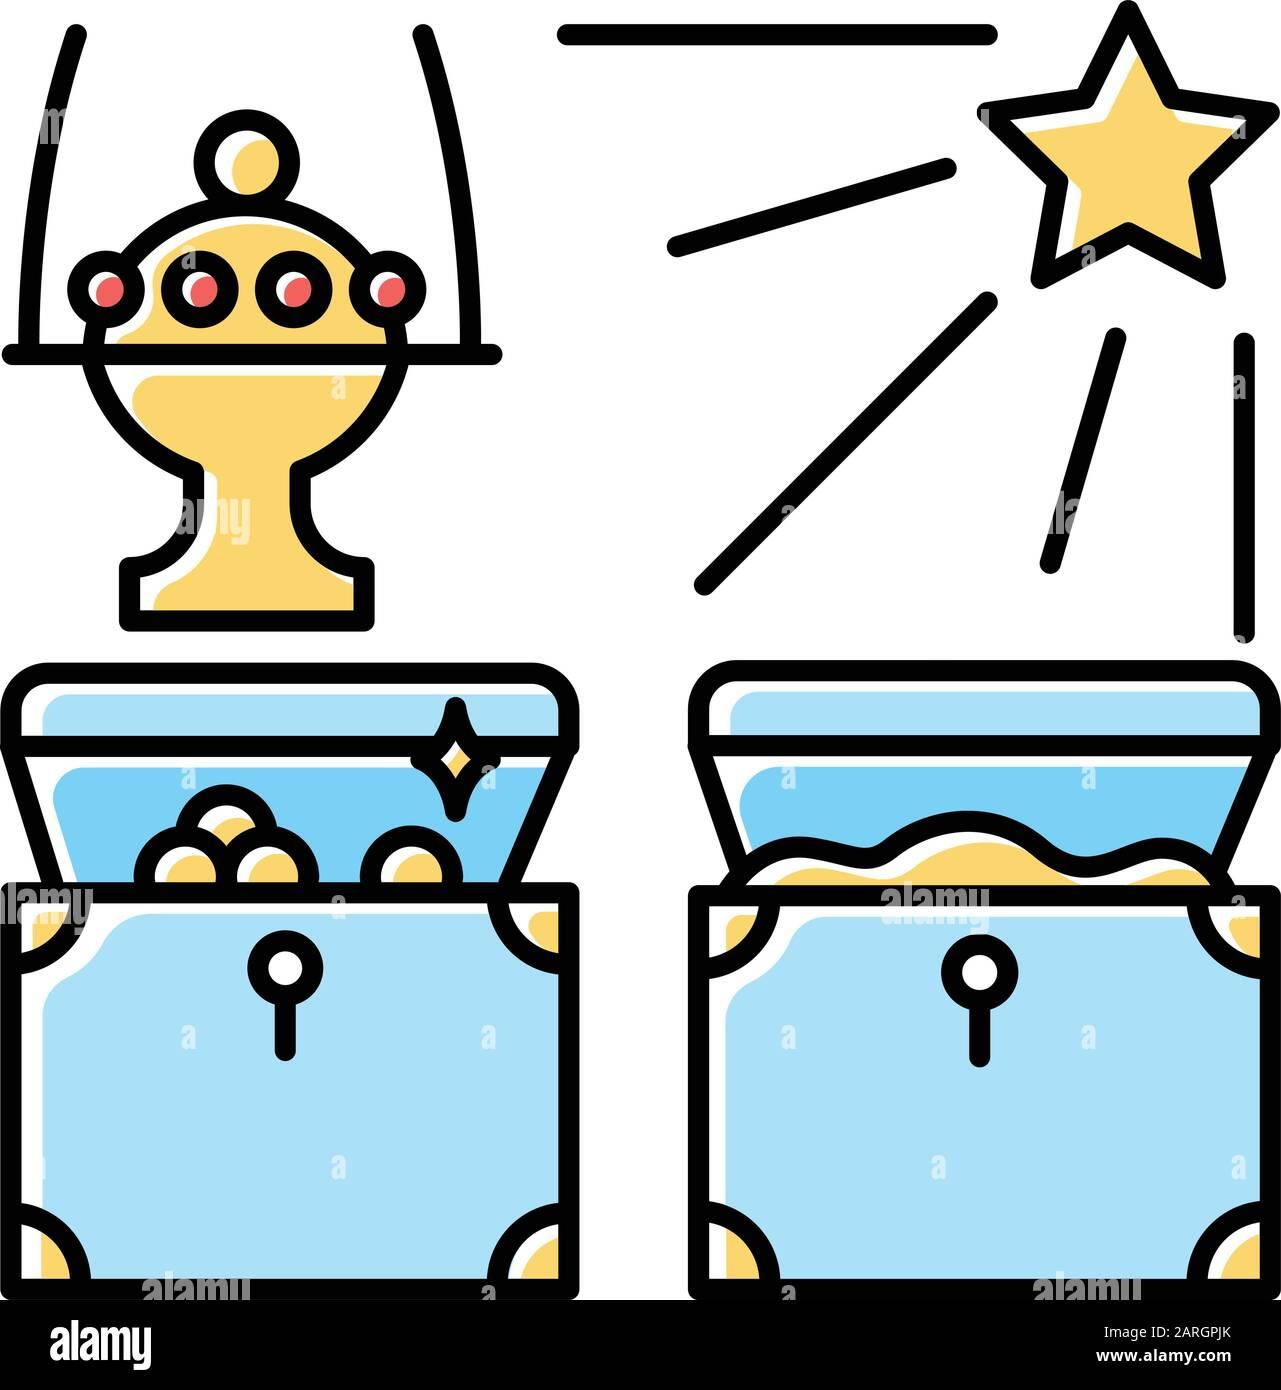 Jesus And Children Cartoon Vector Stock Vector - Illustration of gift,  duty: 94252923